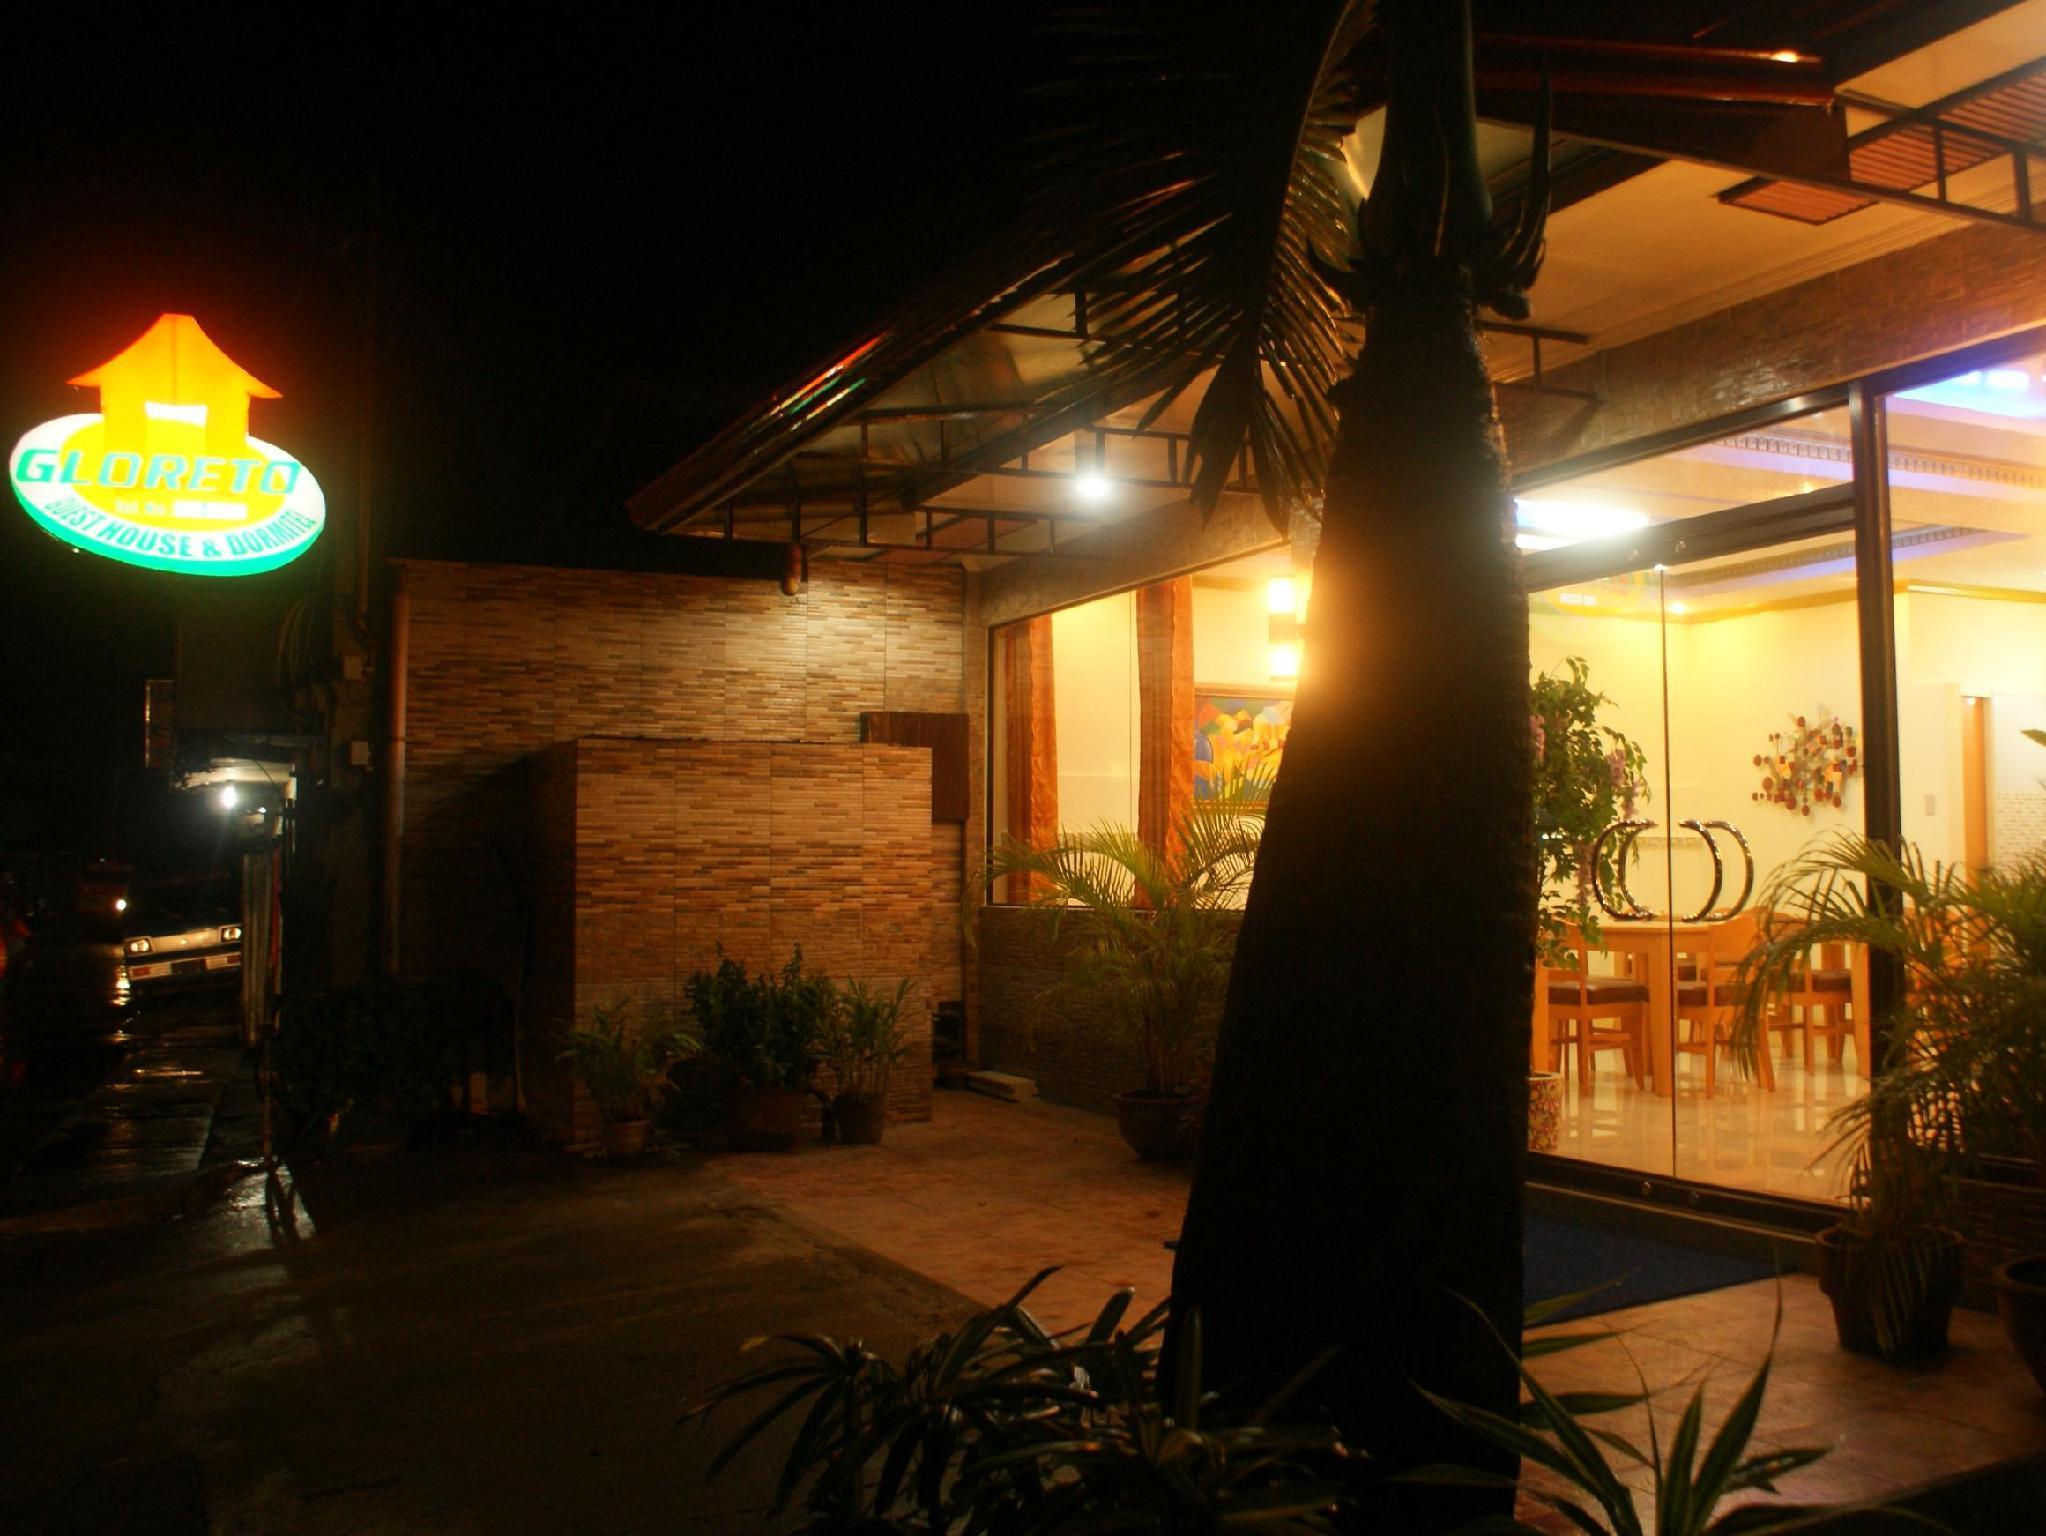 Gloreto Guest House and Dormitel, Butuan City